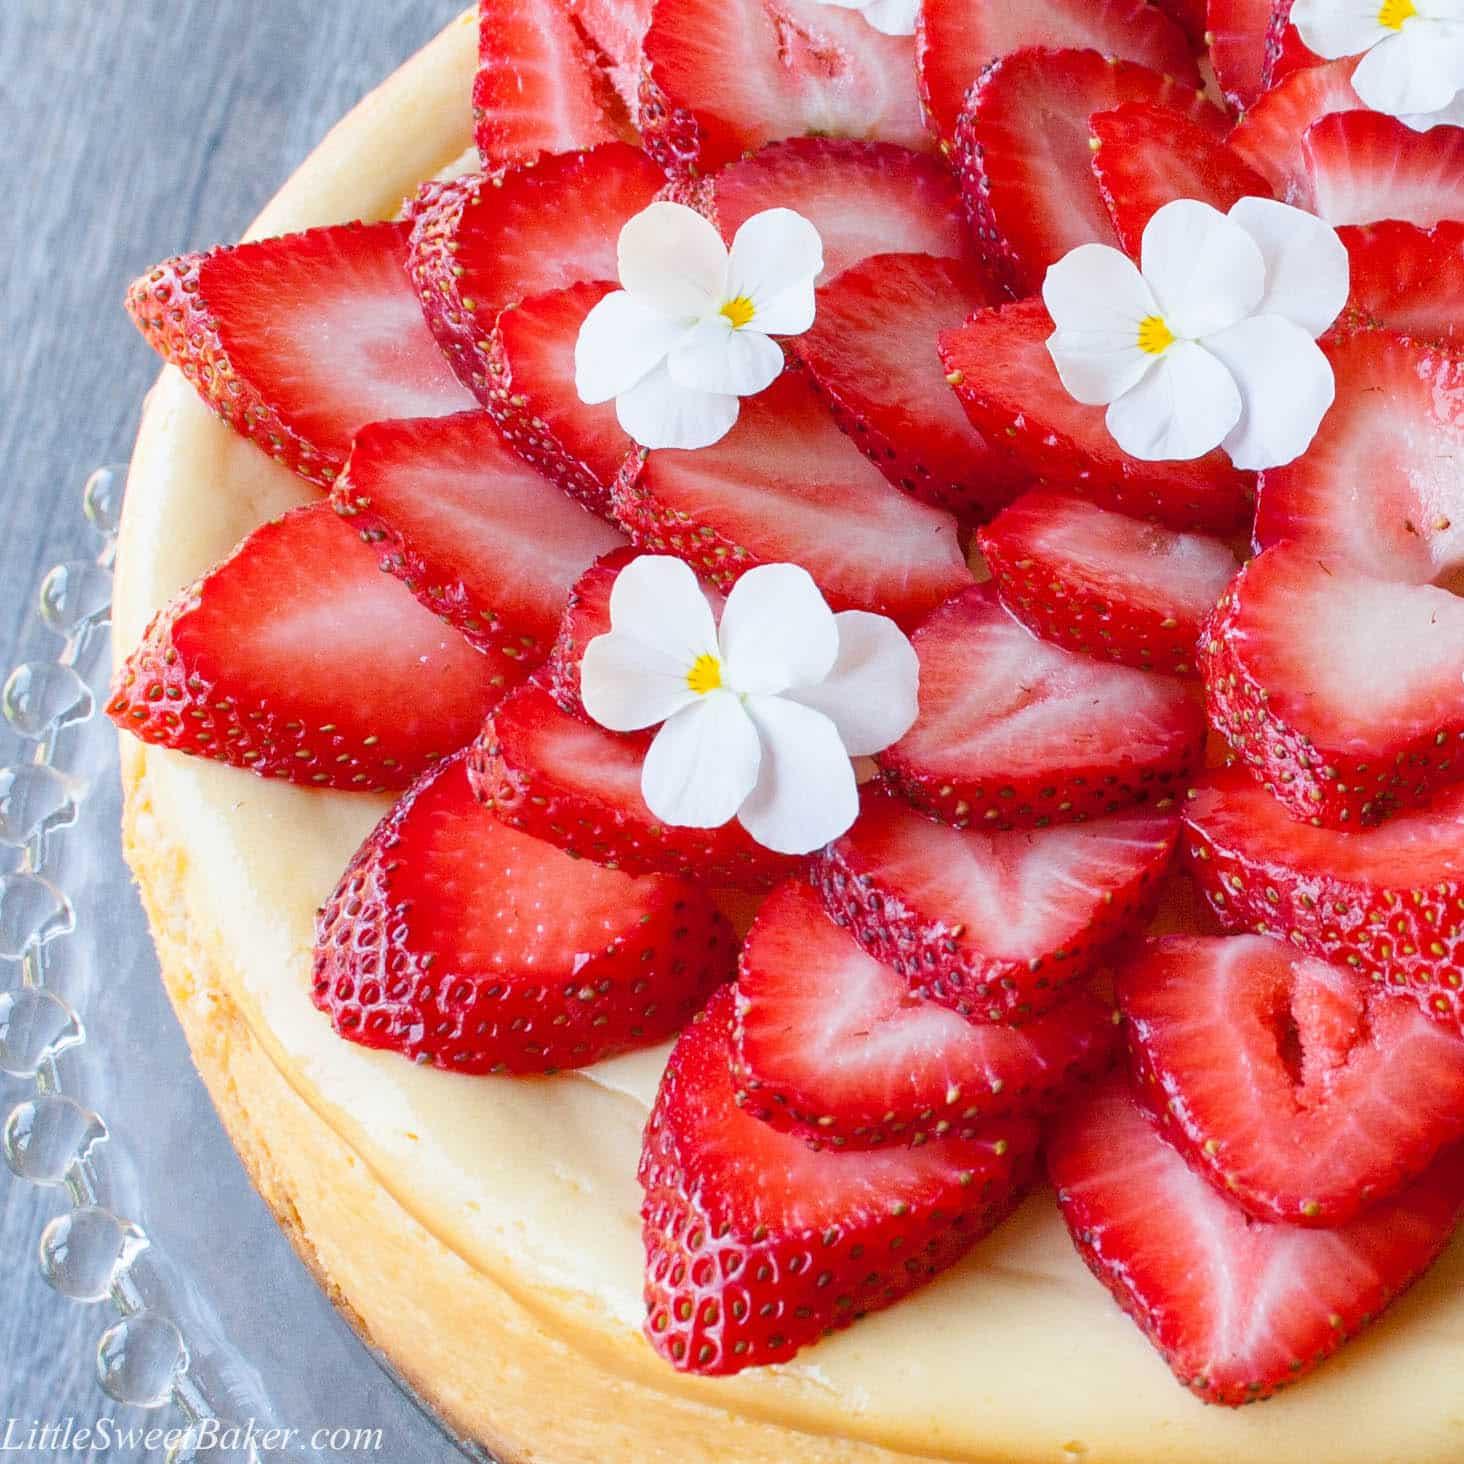 White Chocolate Cheesecake - Little Sweet Baker